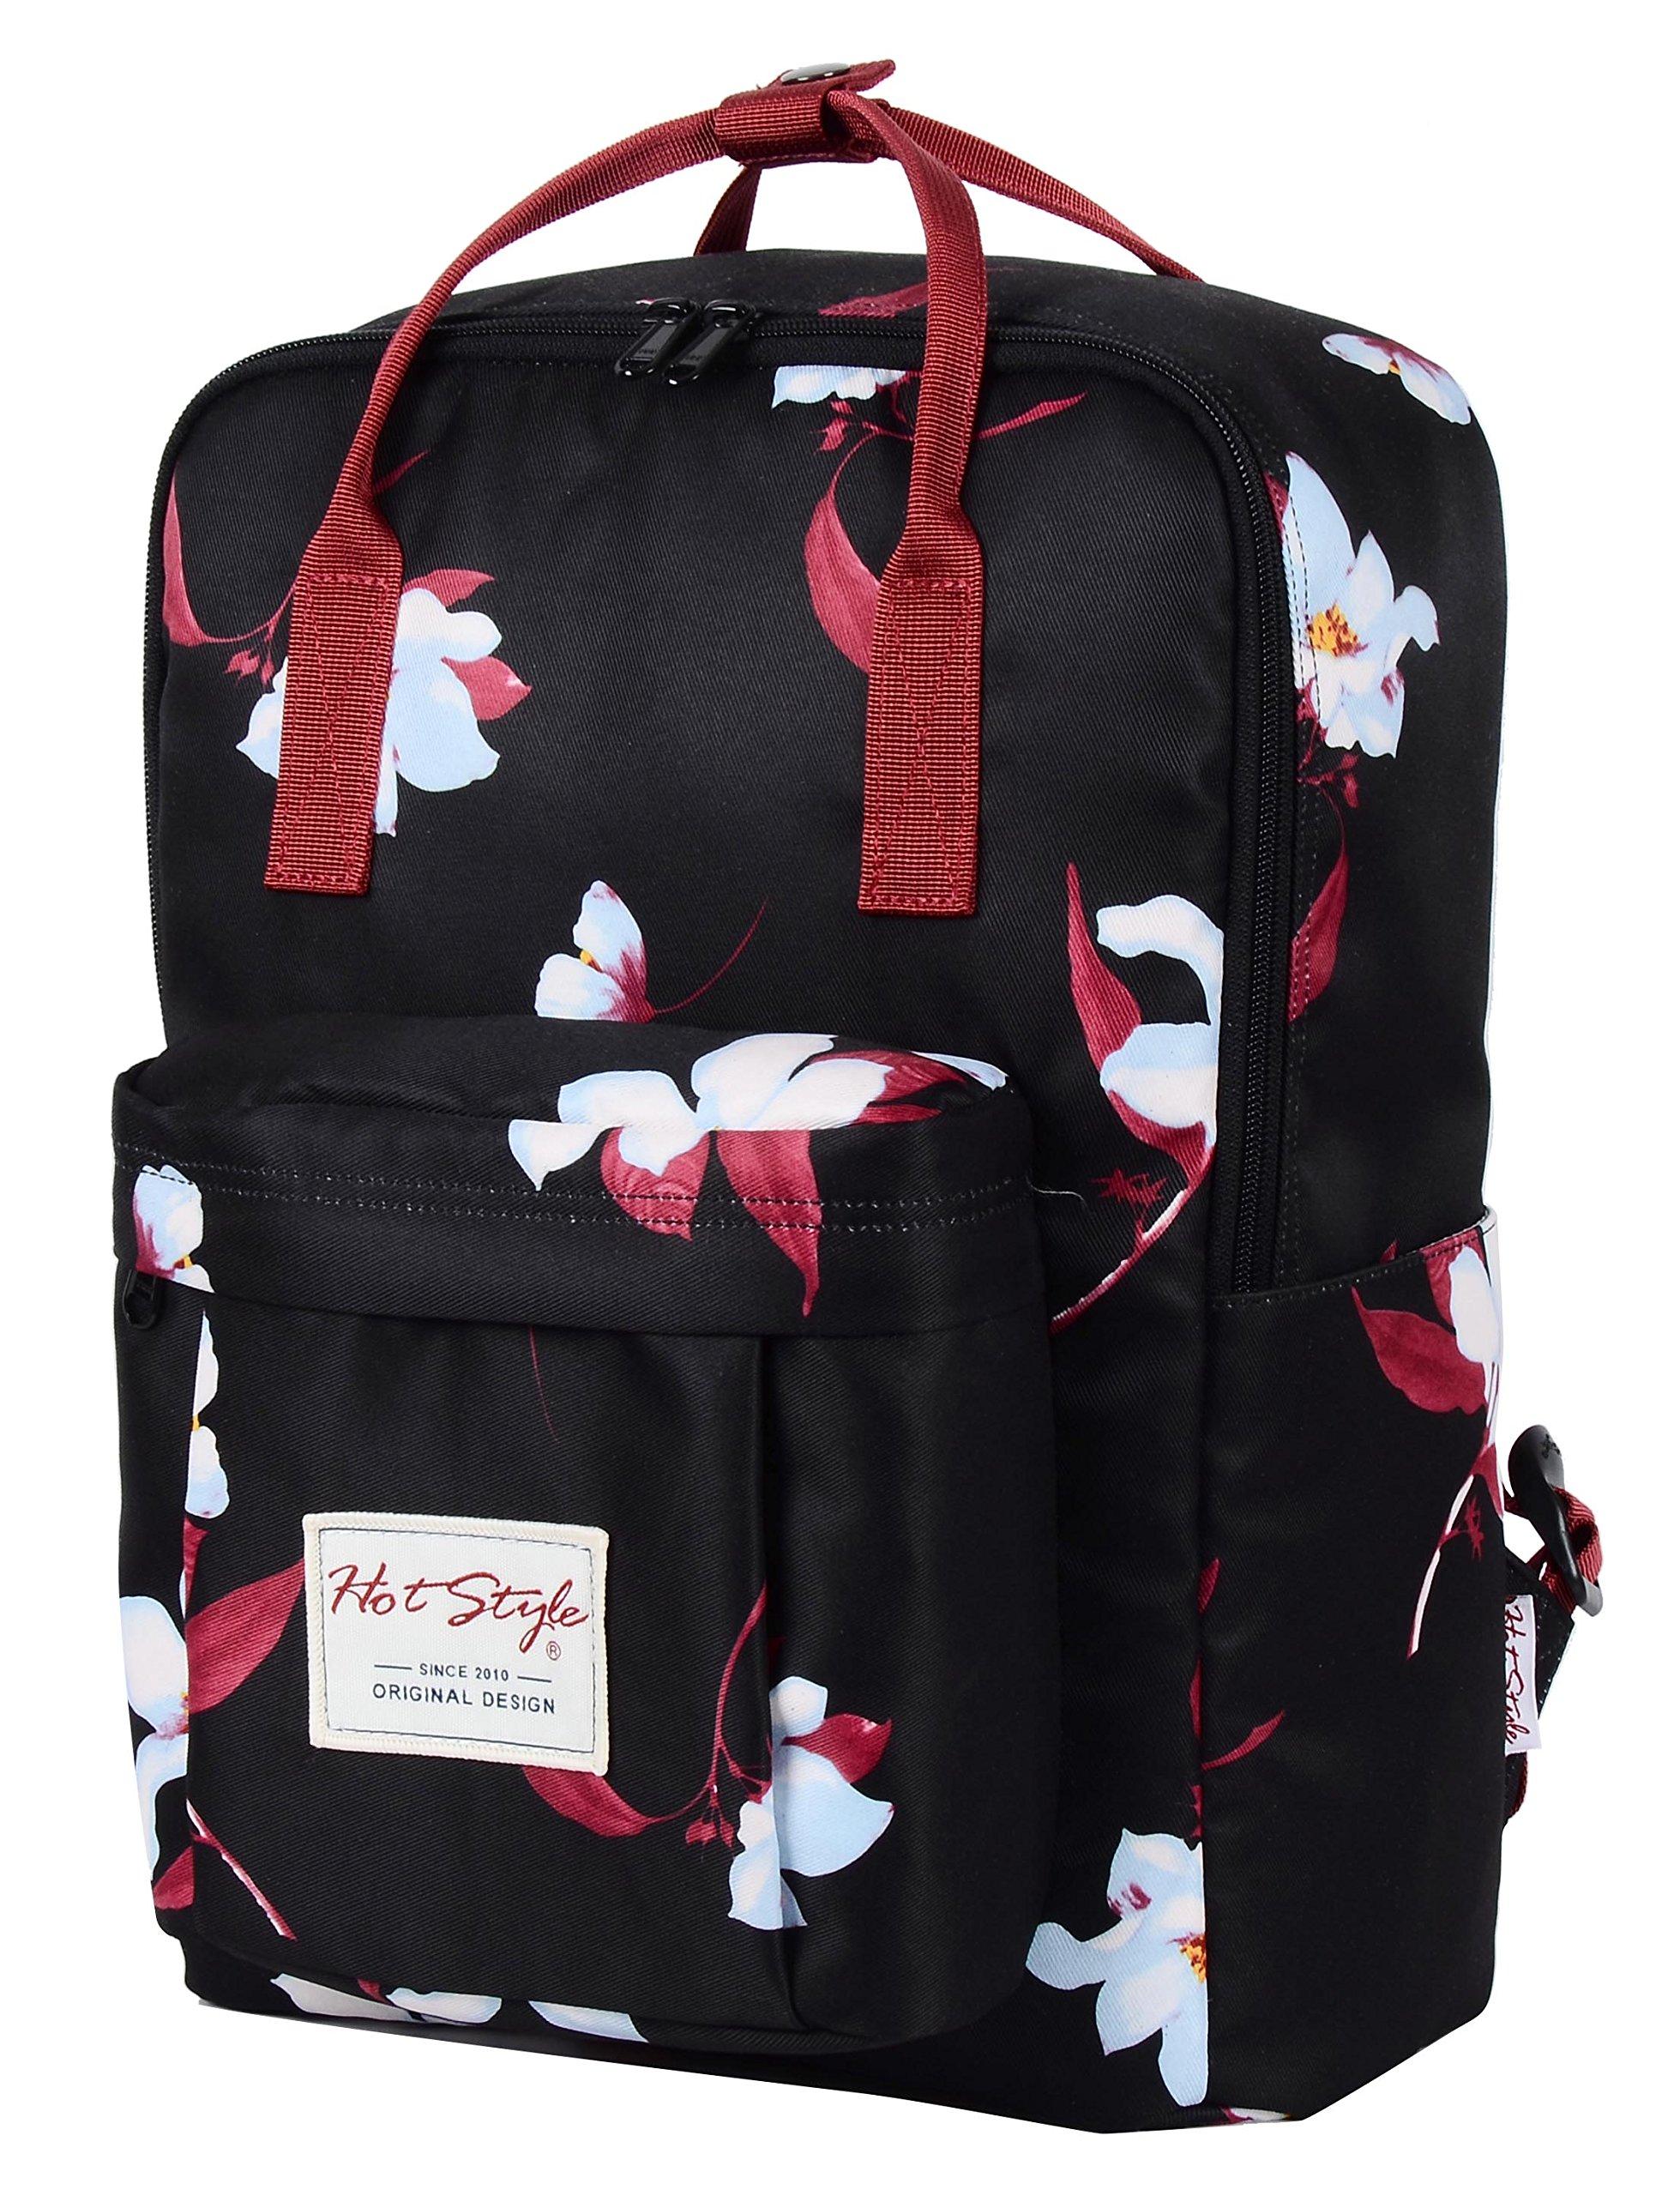 BESTIE Convertible Womens Backpack Daypack Handbag, Magnolia, Black